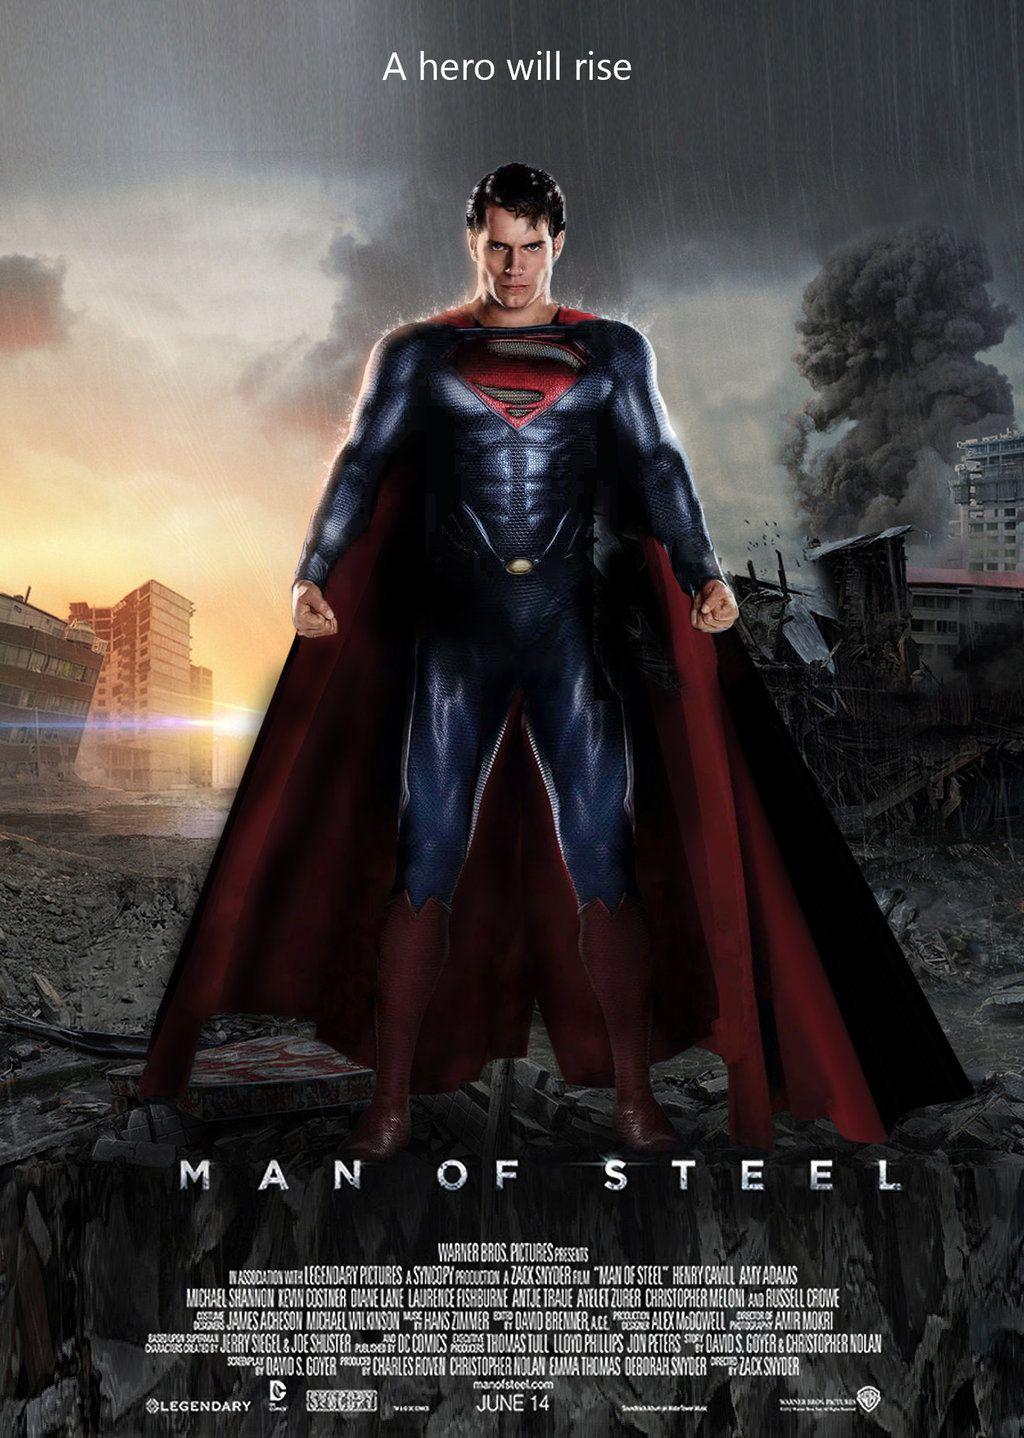 Man Of Steel (2013) ORIGINAL Untouched DD5.1 CH 640Kbps E-AC3 Hindi Audio 655MB